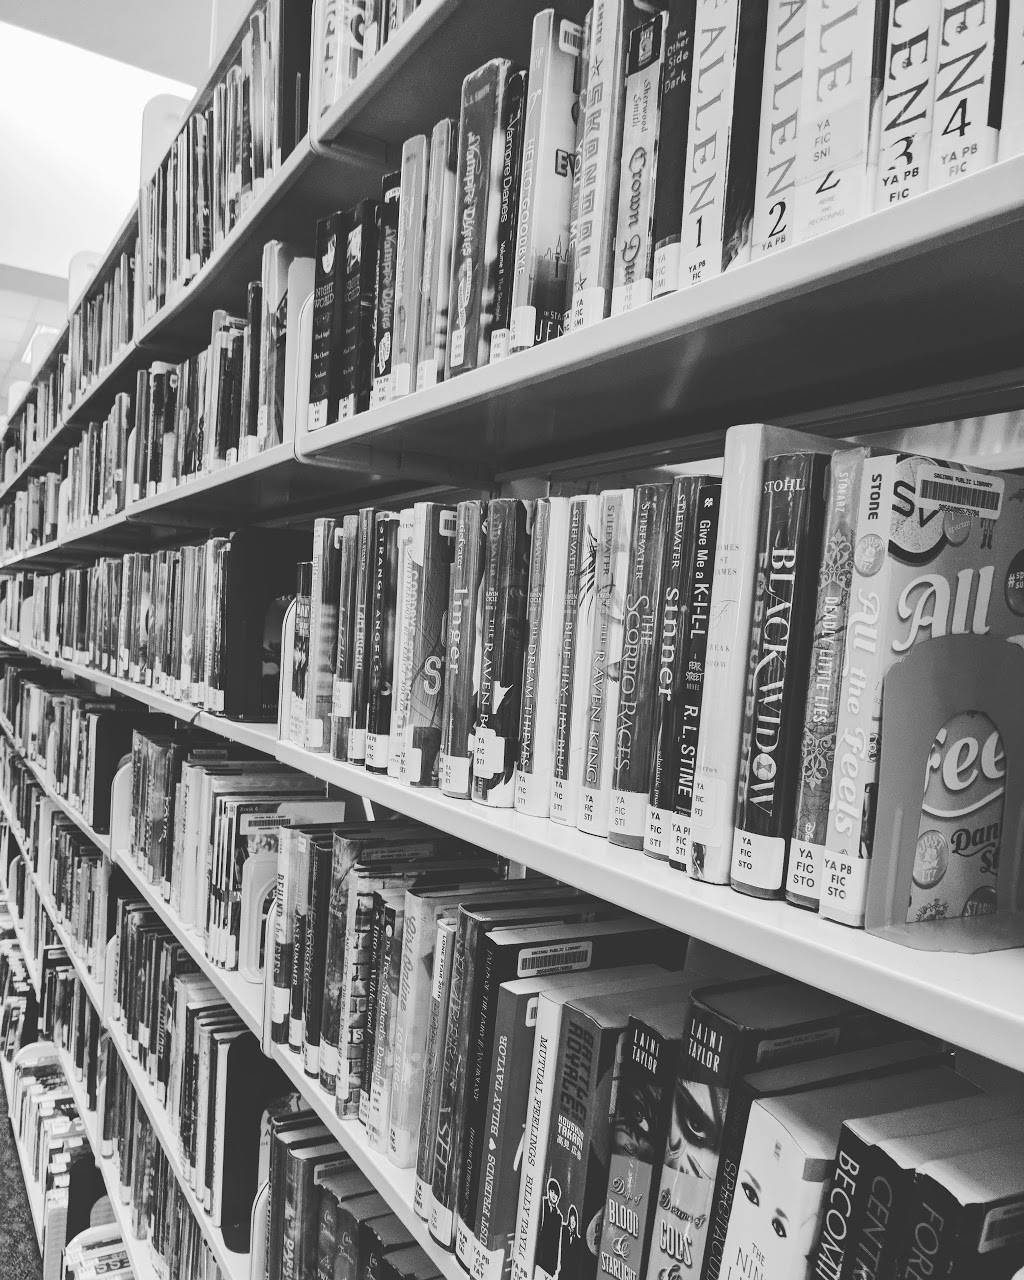 John Ed Keeter Public Library - library  | Photo 10 of 10 | Address: 355 W McLeroy Blvd, Saginaw, TX 76179, USA | Phone: (817) 230-0300